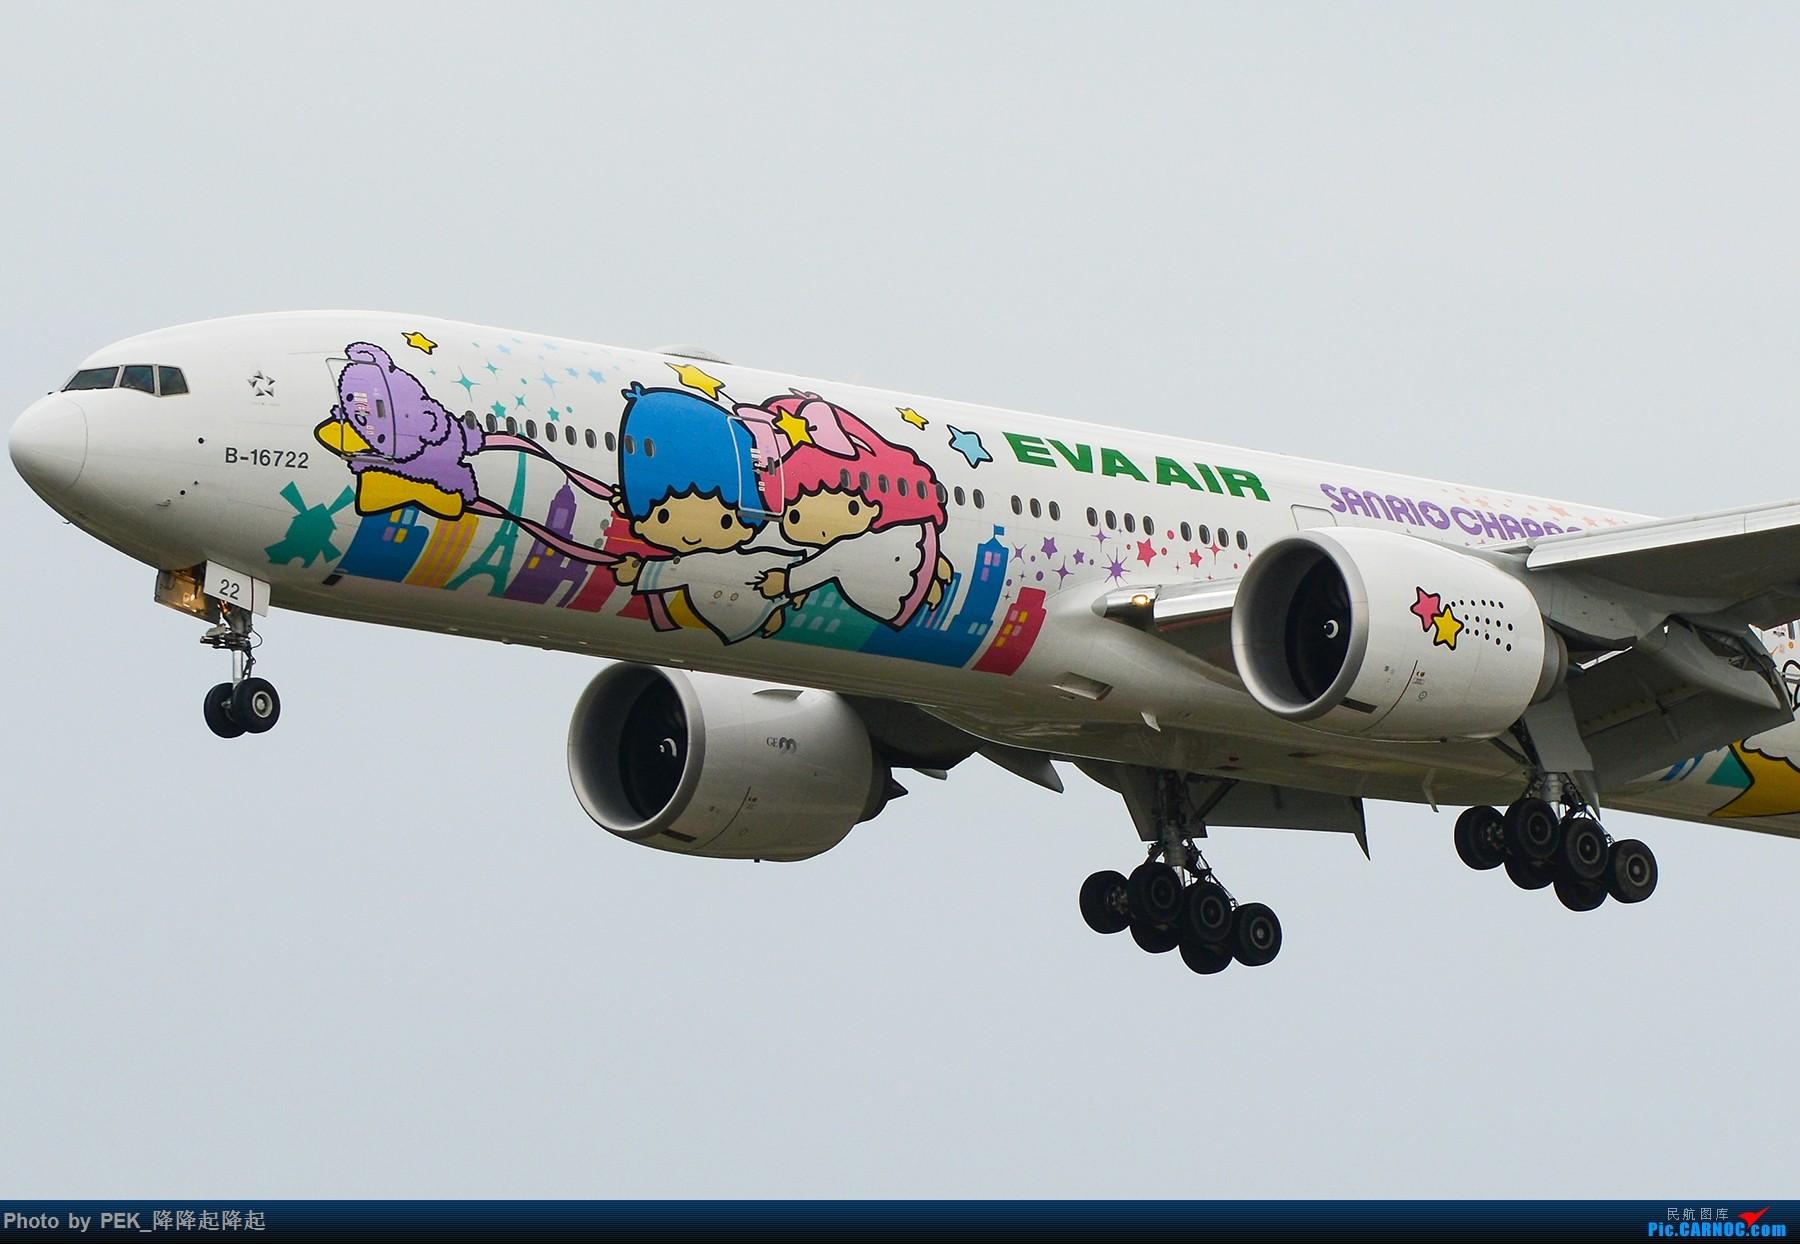 【PEK】EVA喵机 B-16722 1800x1200 BOEING 777-300ER B-16722 中国北京首都国际机场